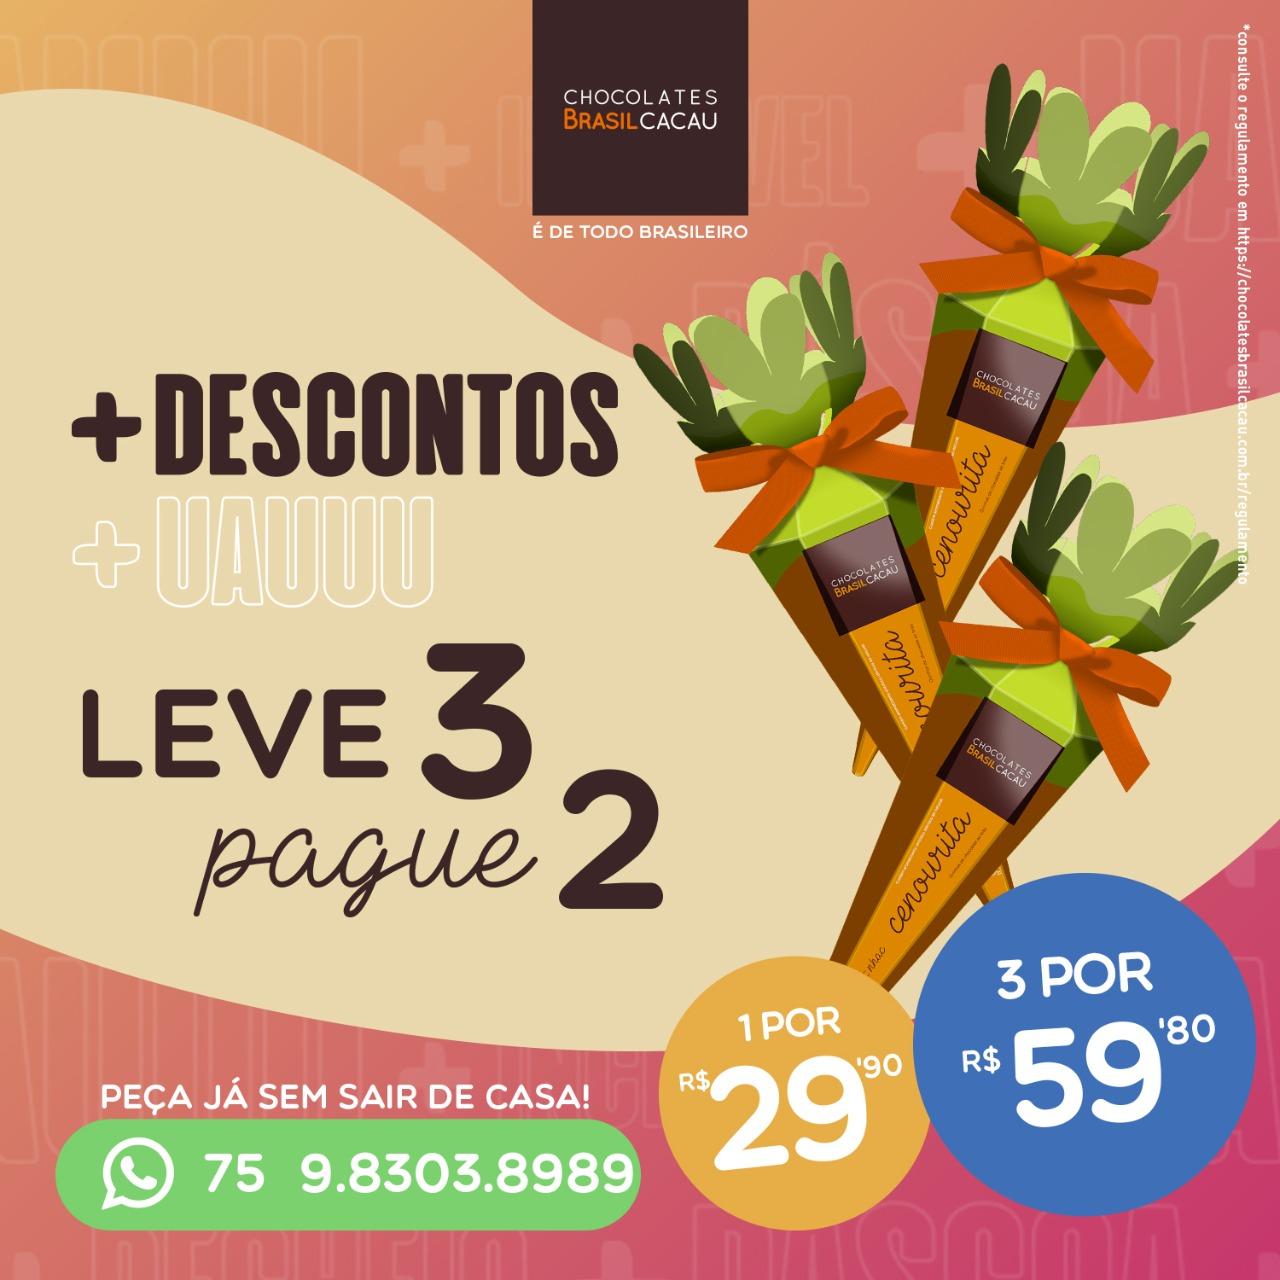 6e7ef23f-65a5-467b-bc3e-dc0566497942